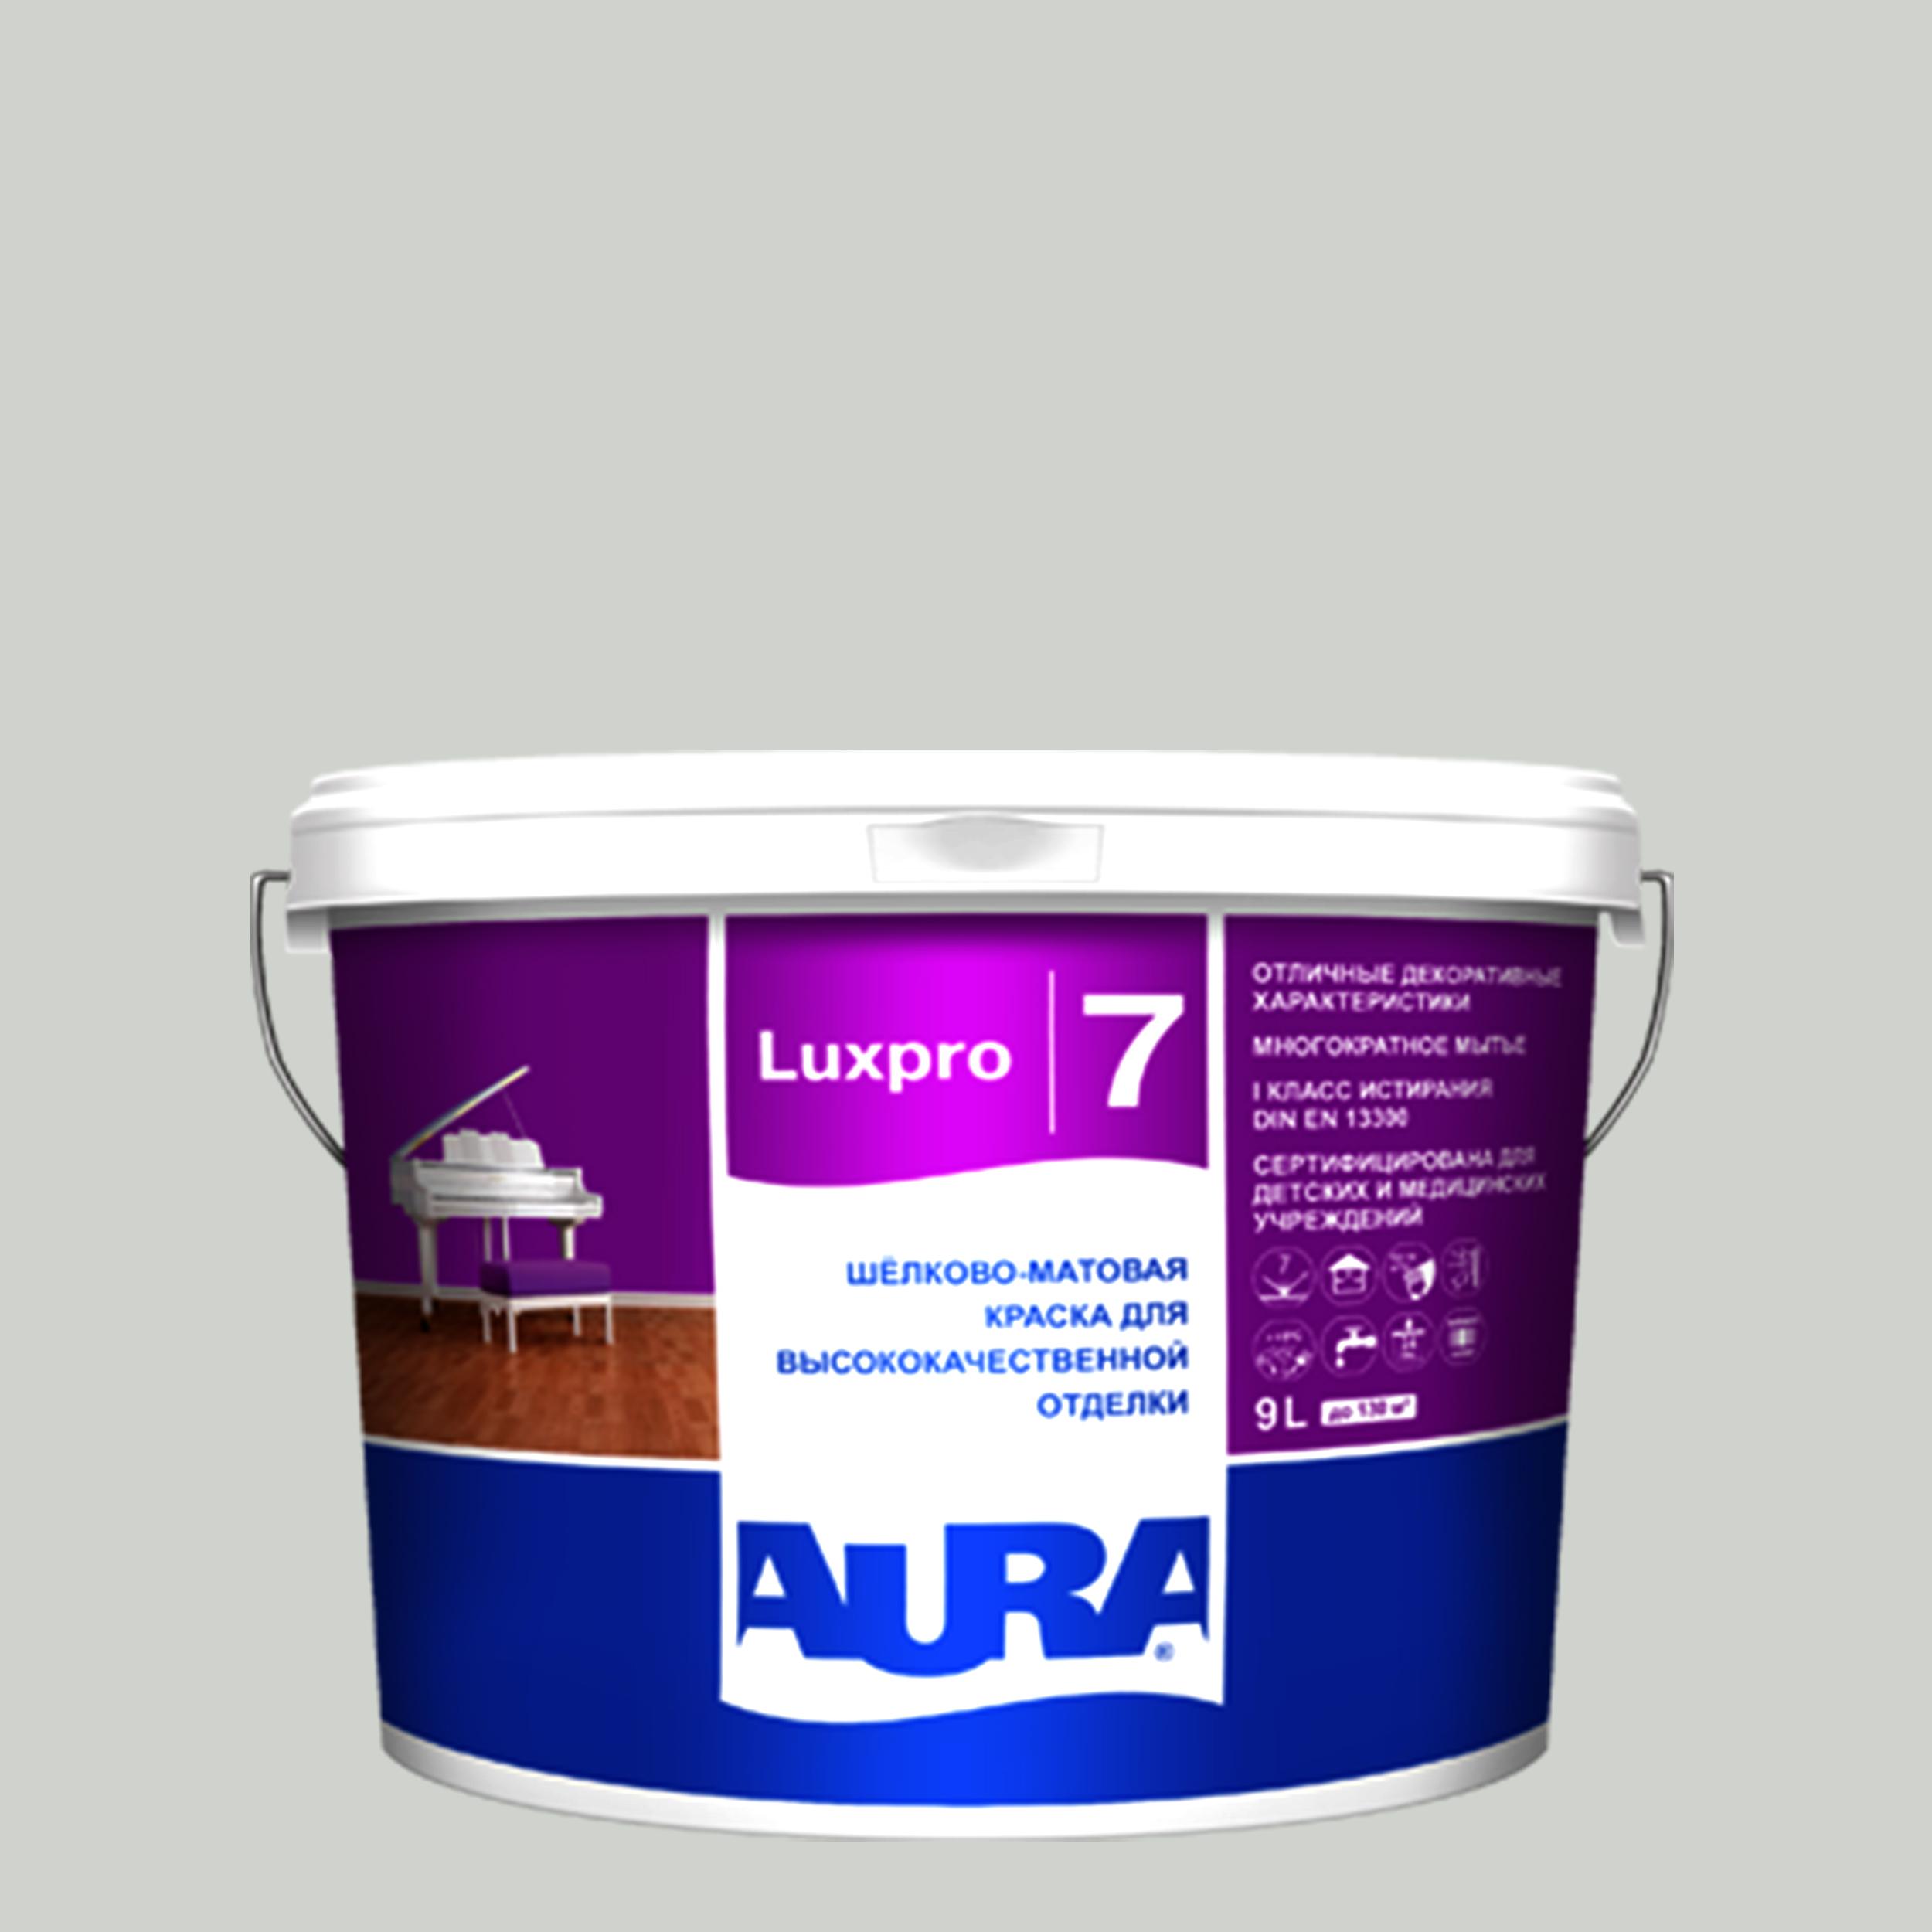 Фото 4 - Краска интерьерная, Aura LuxPRO 7, RAL 1034, 11 кг.